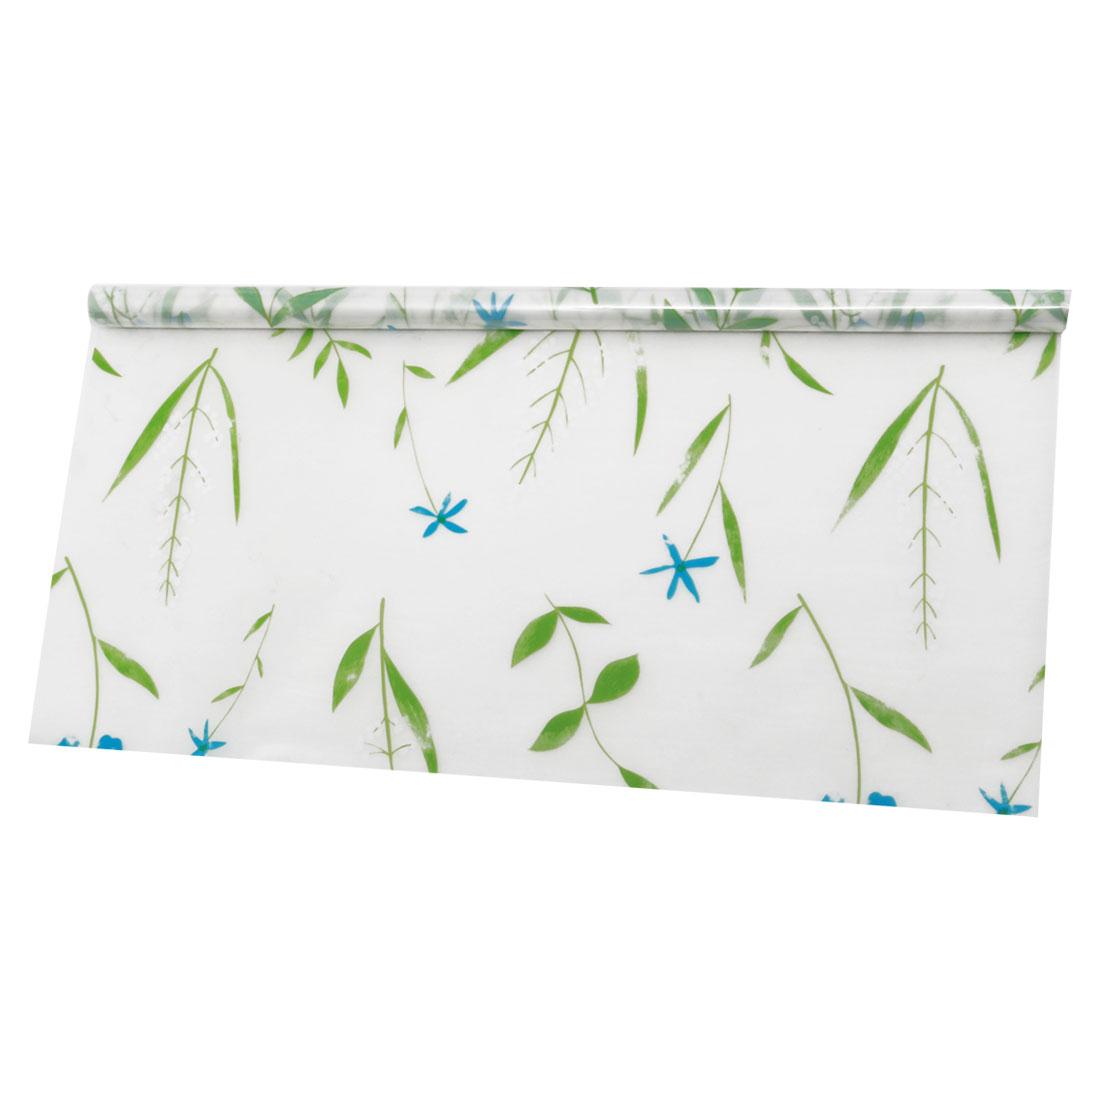 "Self-sticky 23.6"" x 78.7"" Water Resistant Window Film Grass Pattern"